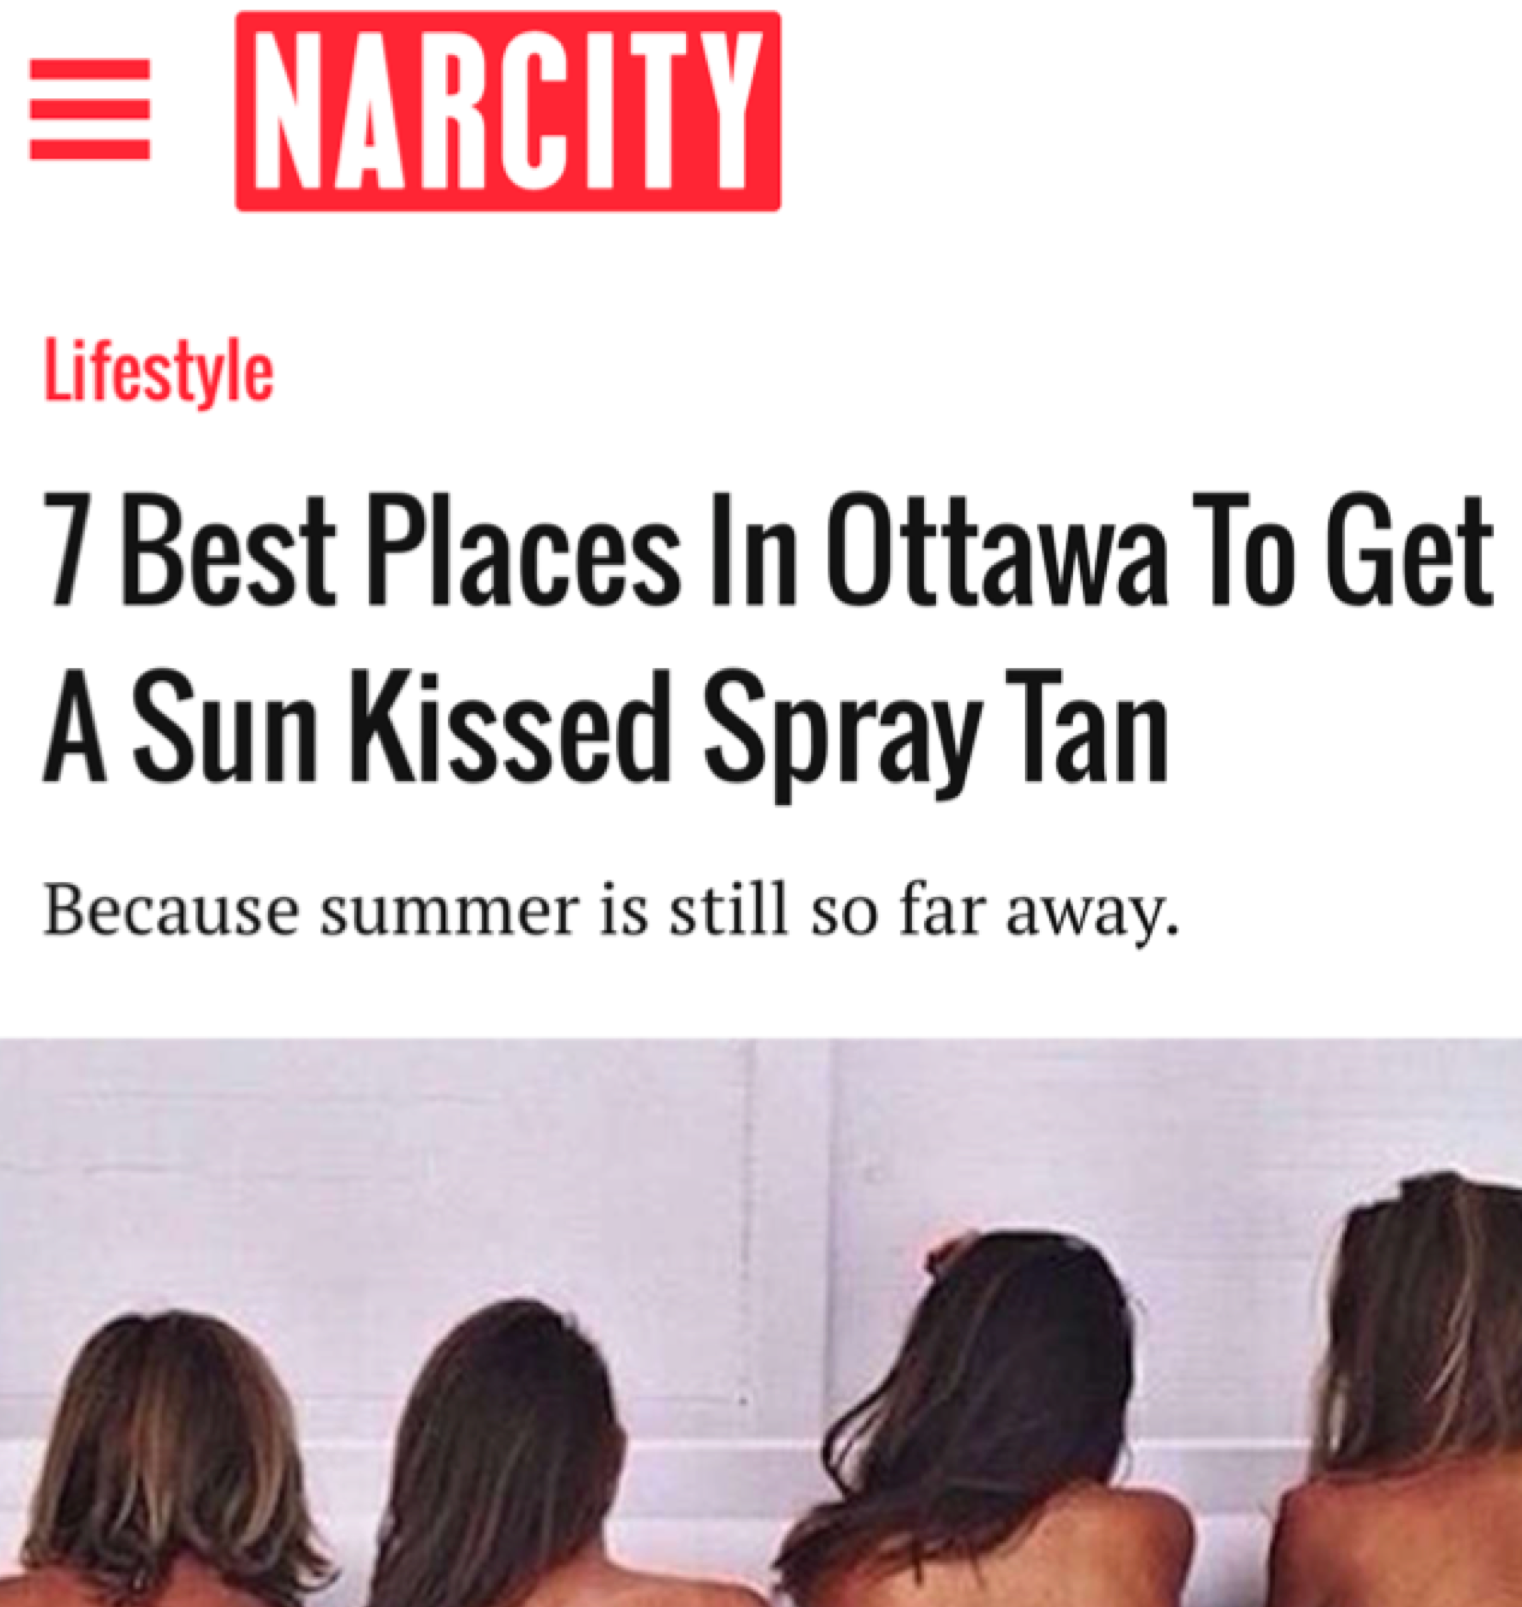 Narcity Ottawa